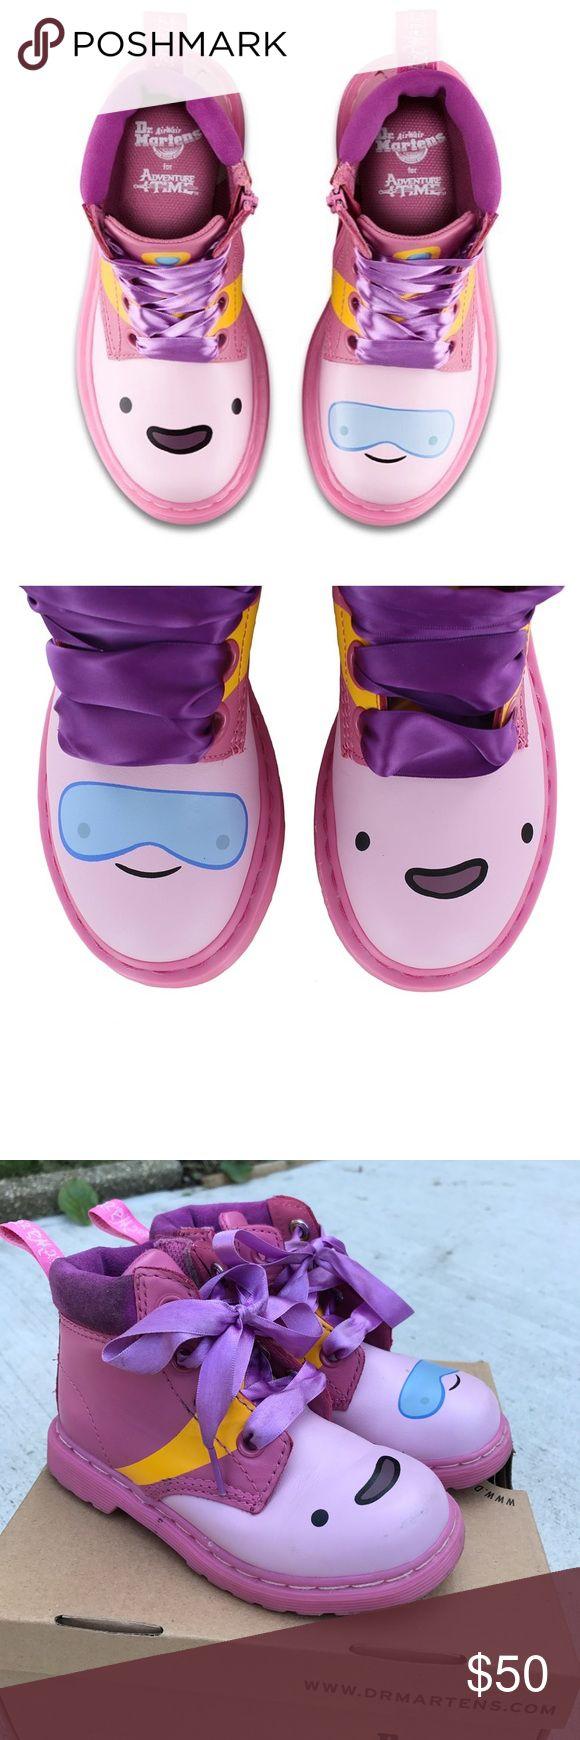 Girls Dr. Martens Cartoon Network collaboration! Make an offer! Dr. Martens Shoes Boots